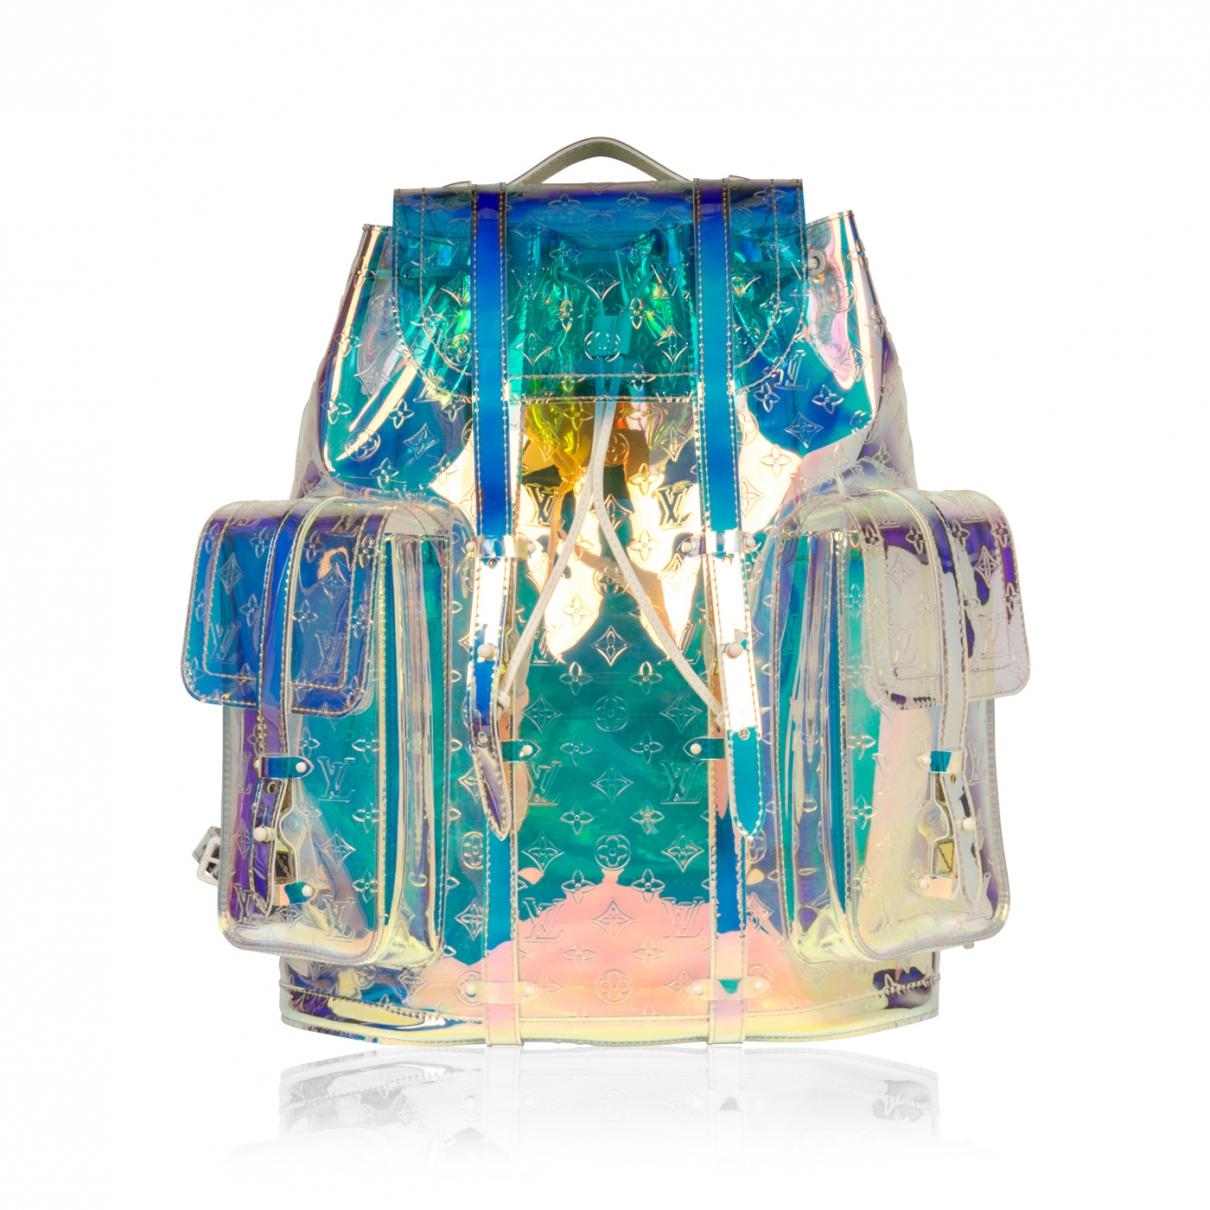 Louis Vuitton - Sac Christopher Backpack pour homme - multicolore